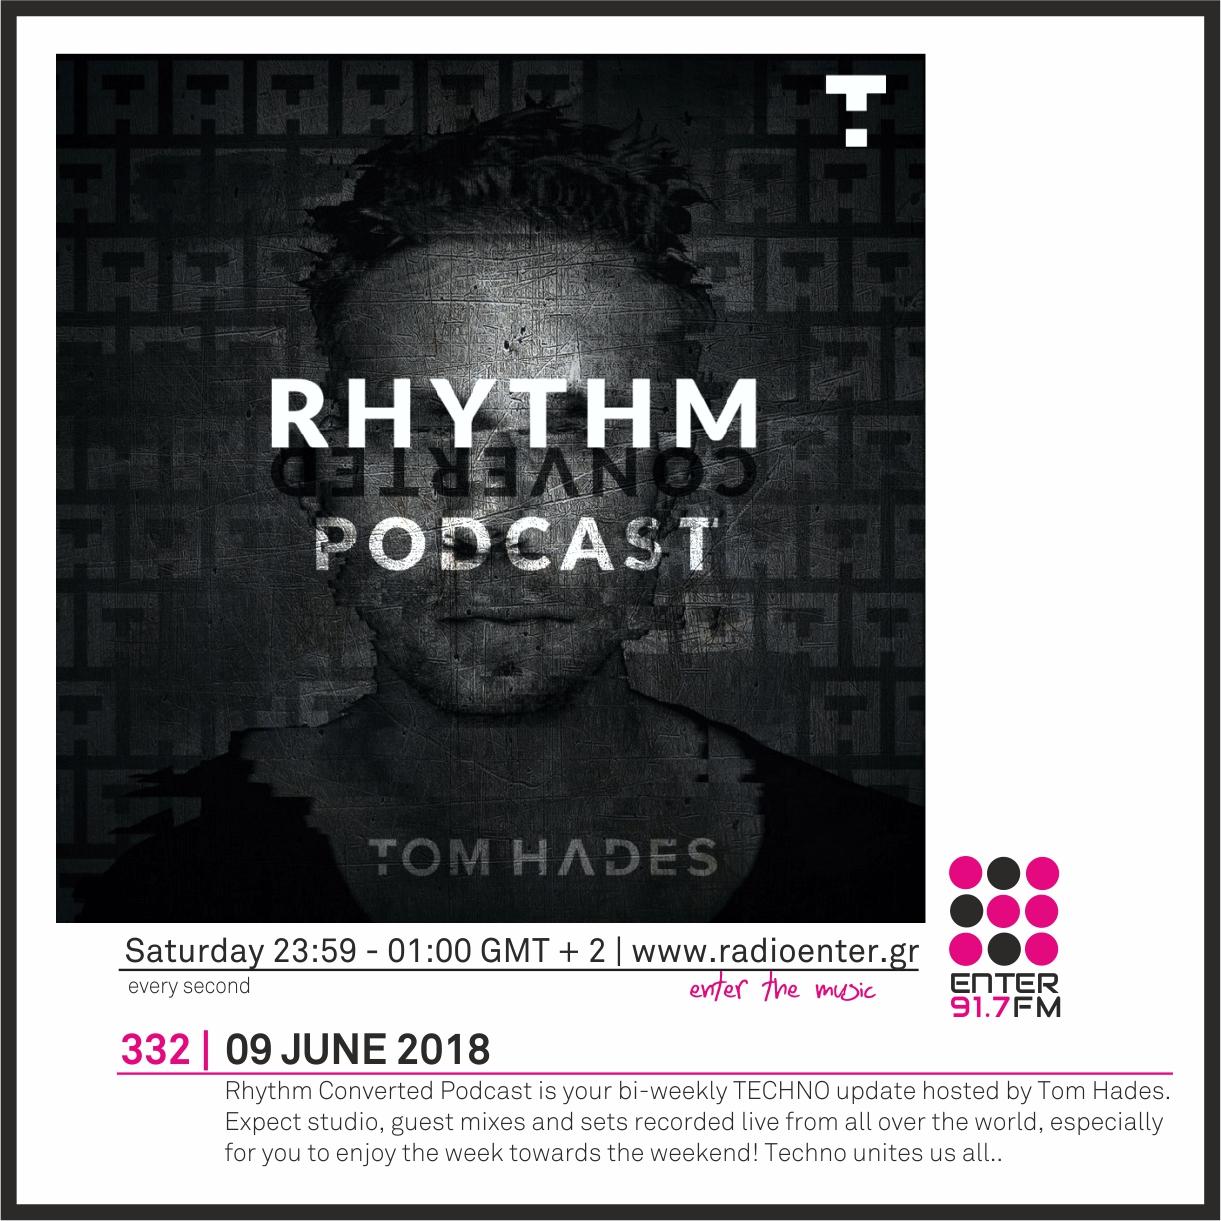 2018.06.09 - Tom Hades 'Rhythm Converter' 332